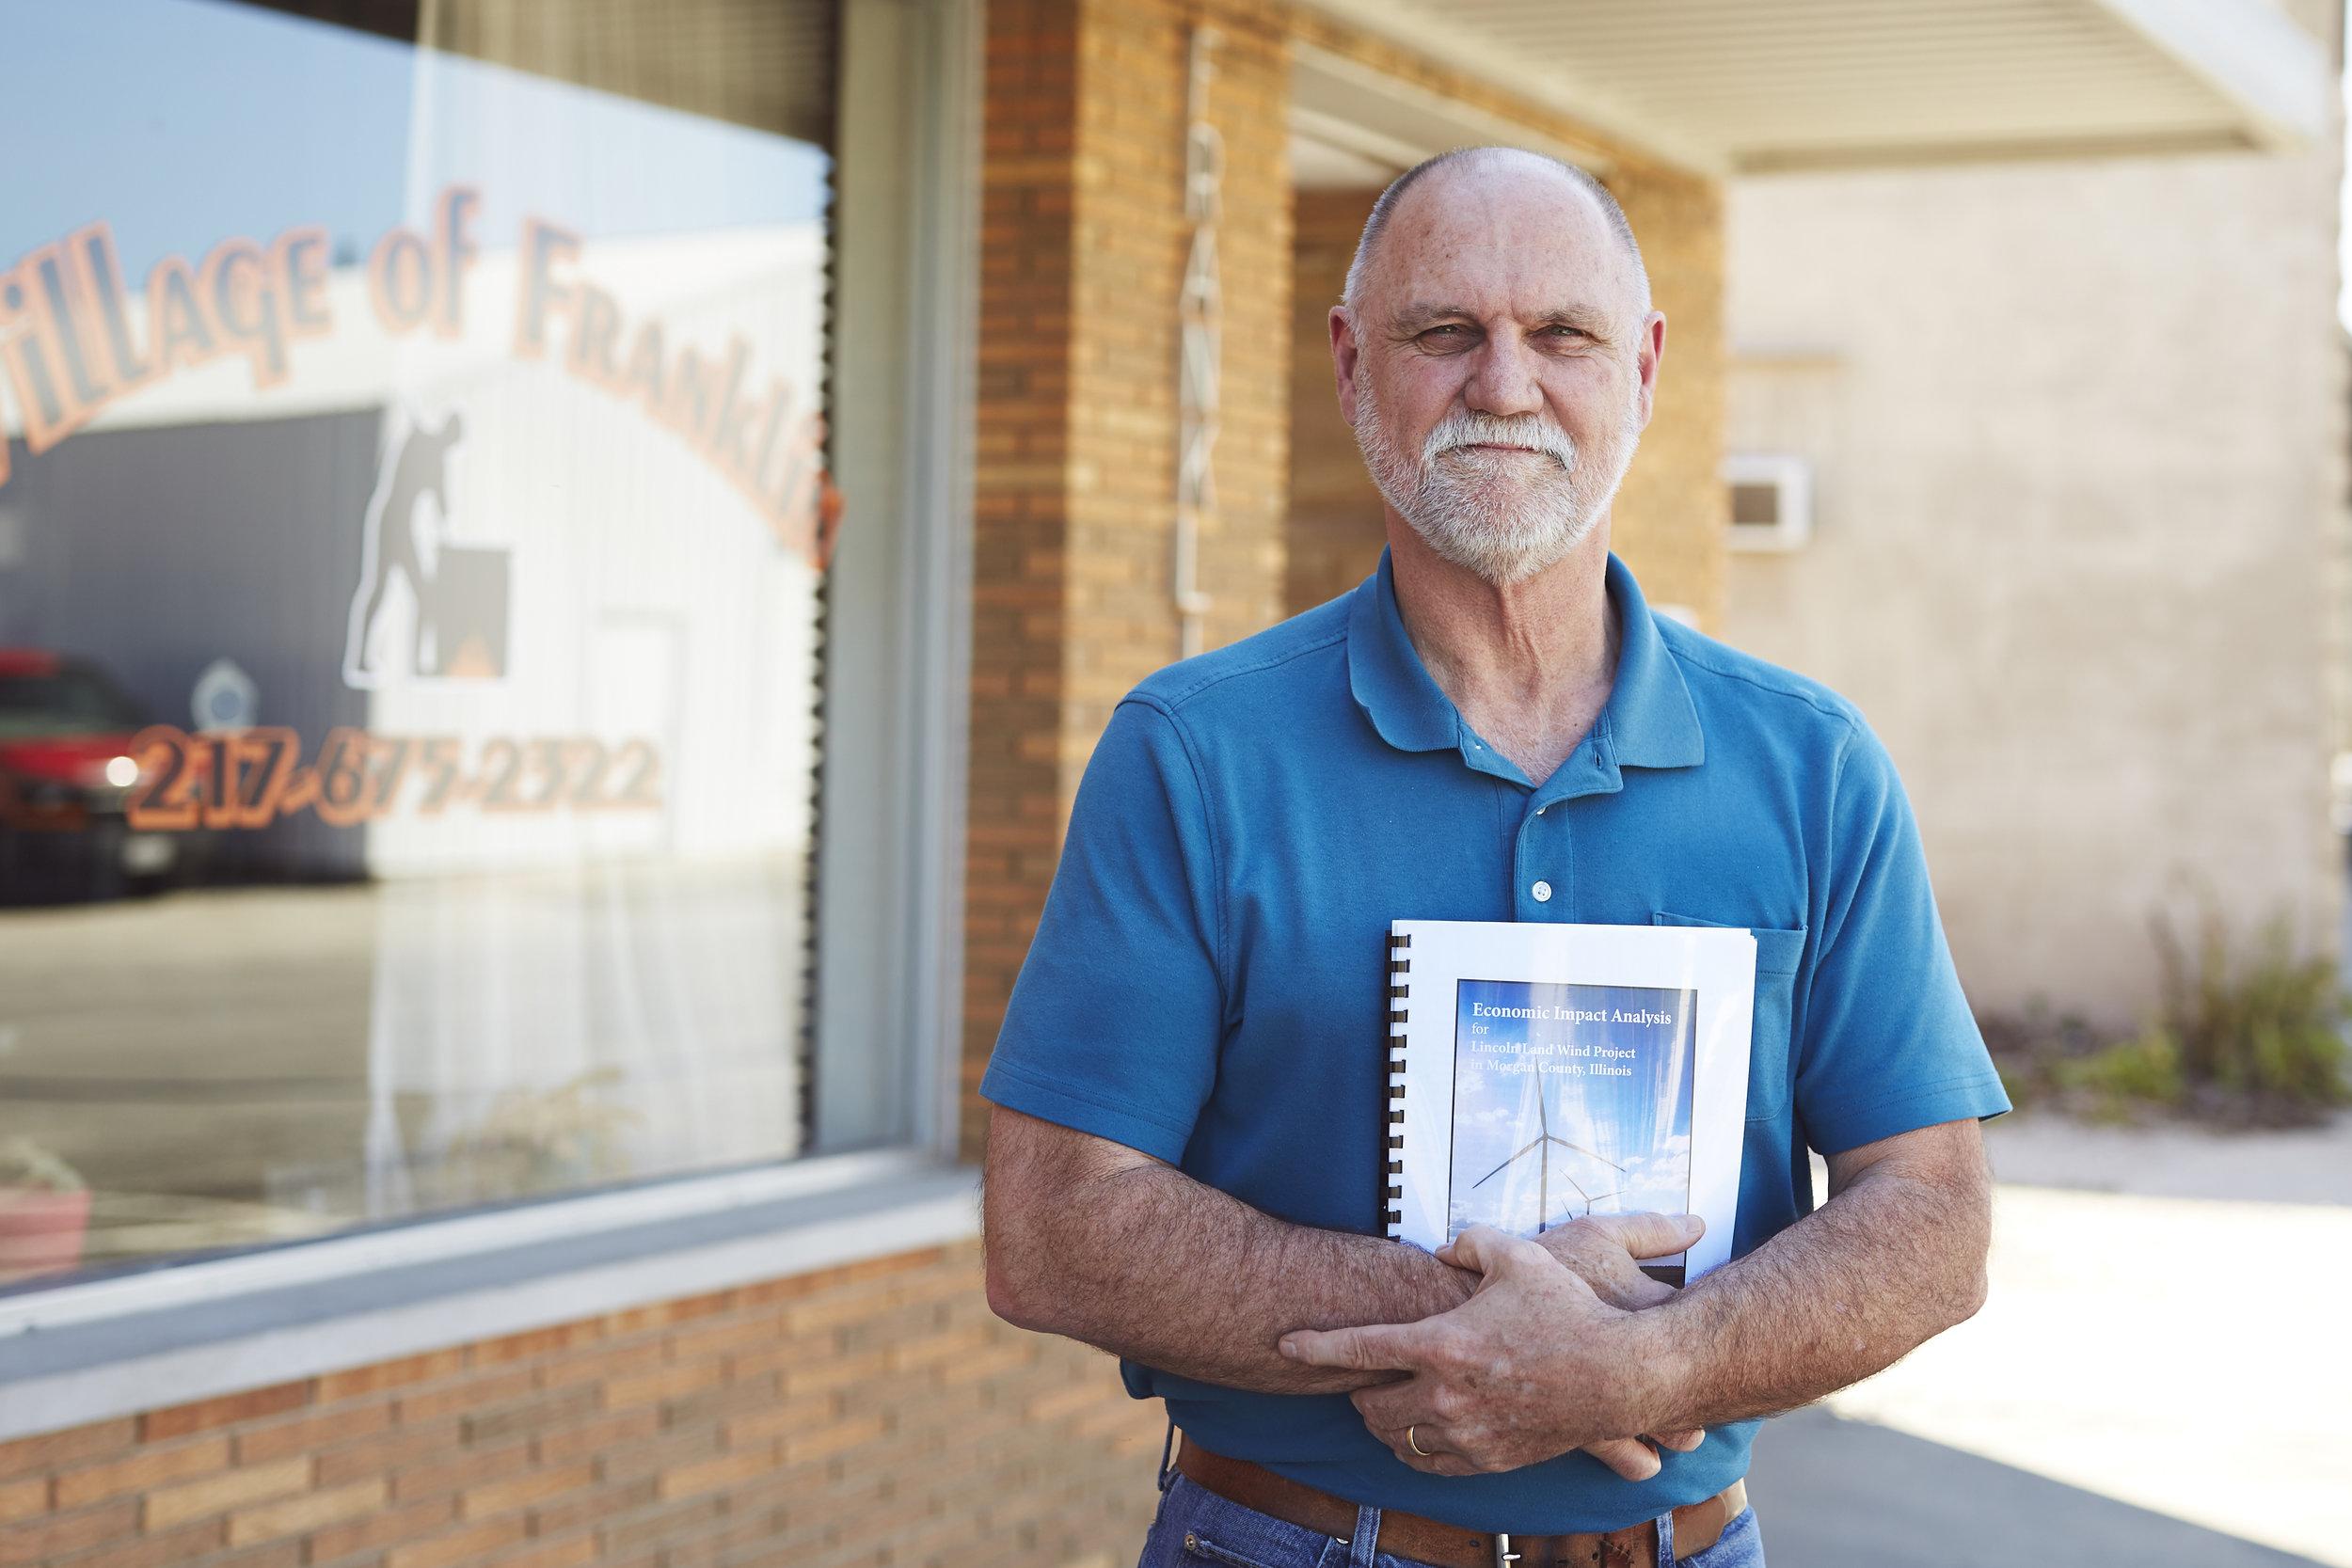 Franklin Illinois Mayor Portrait